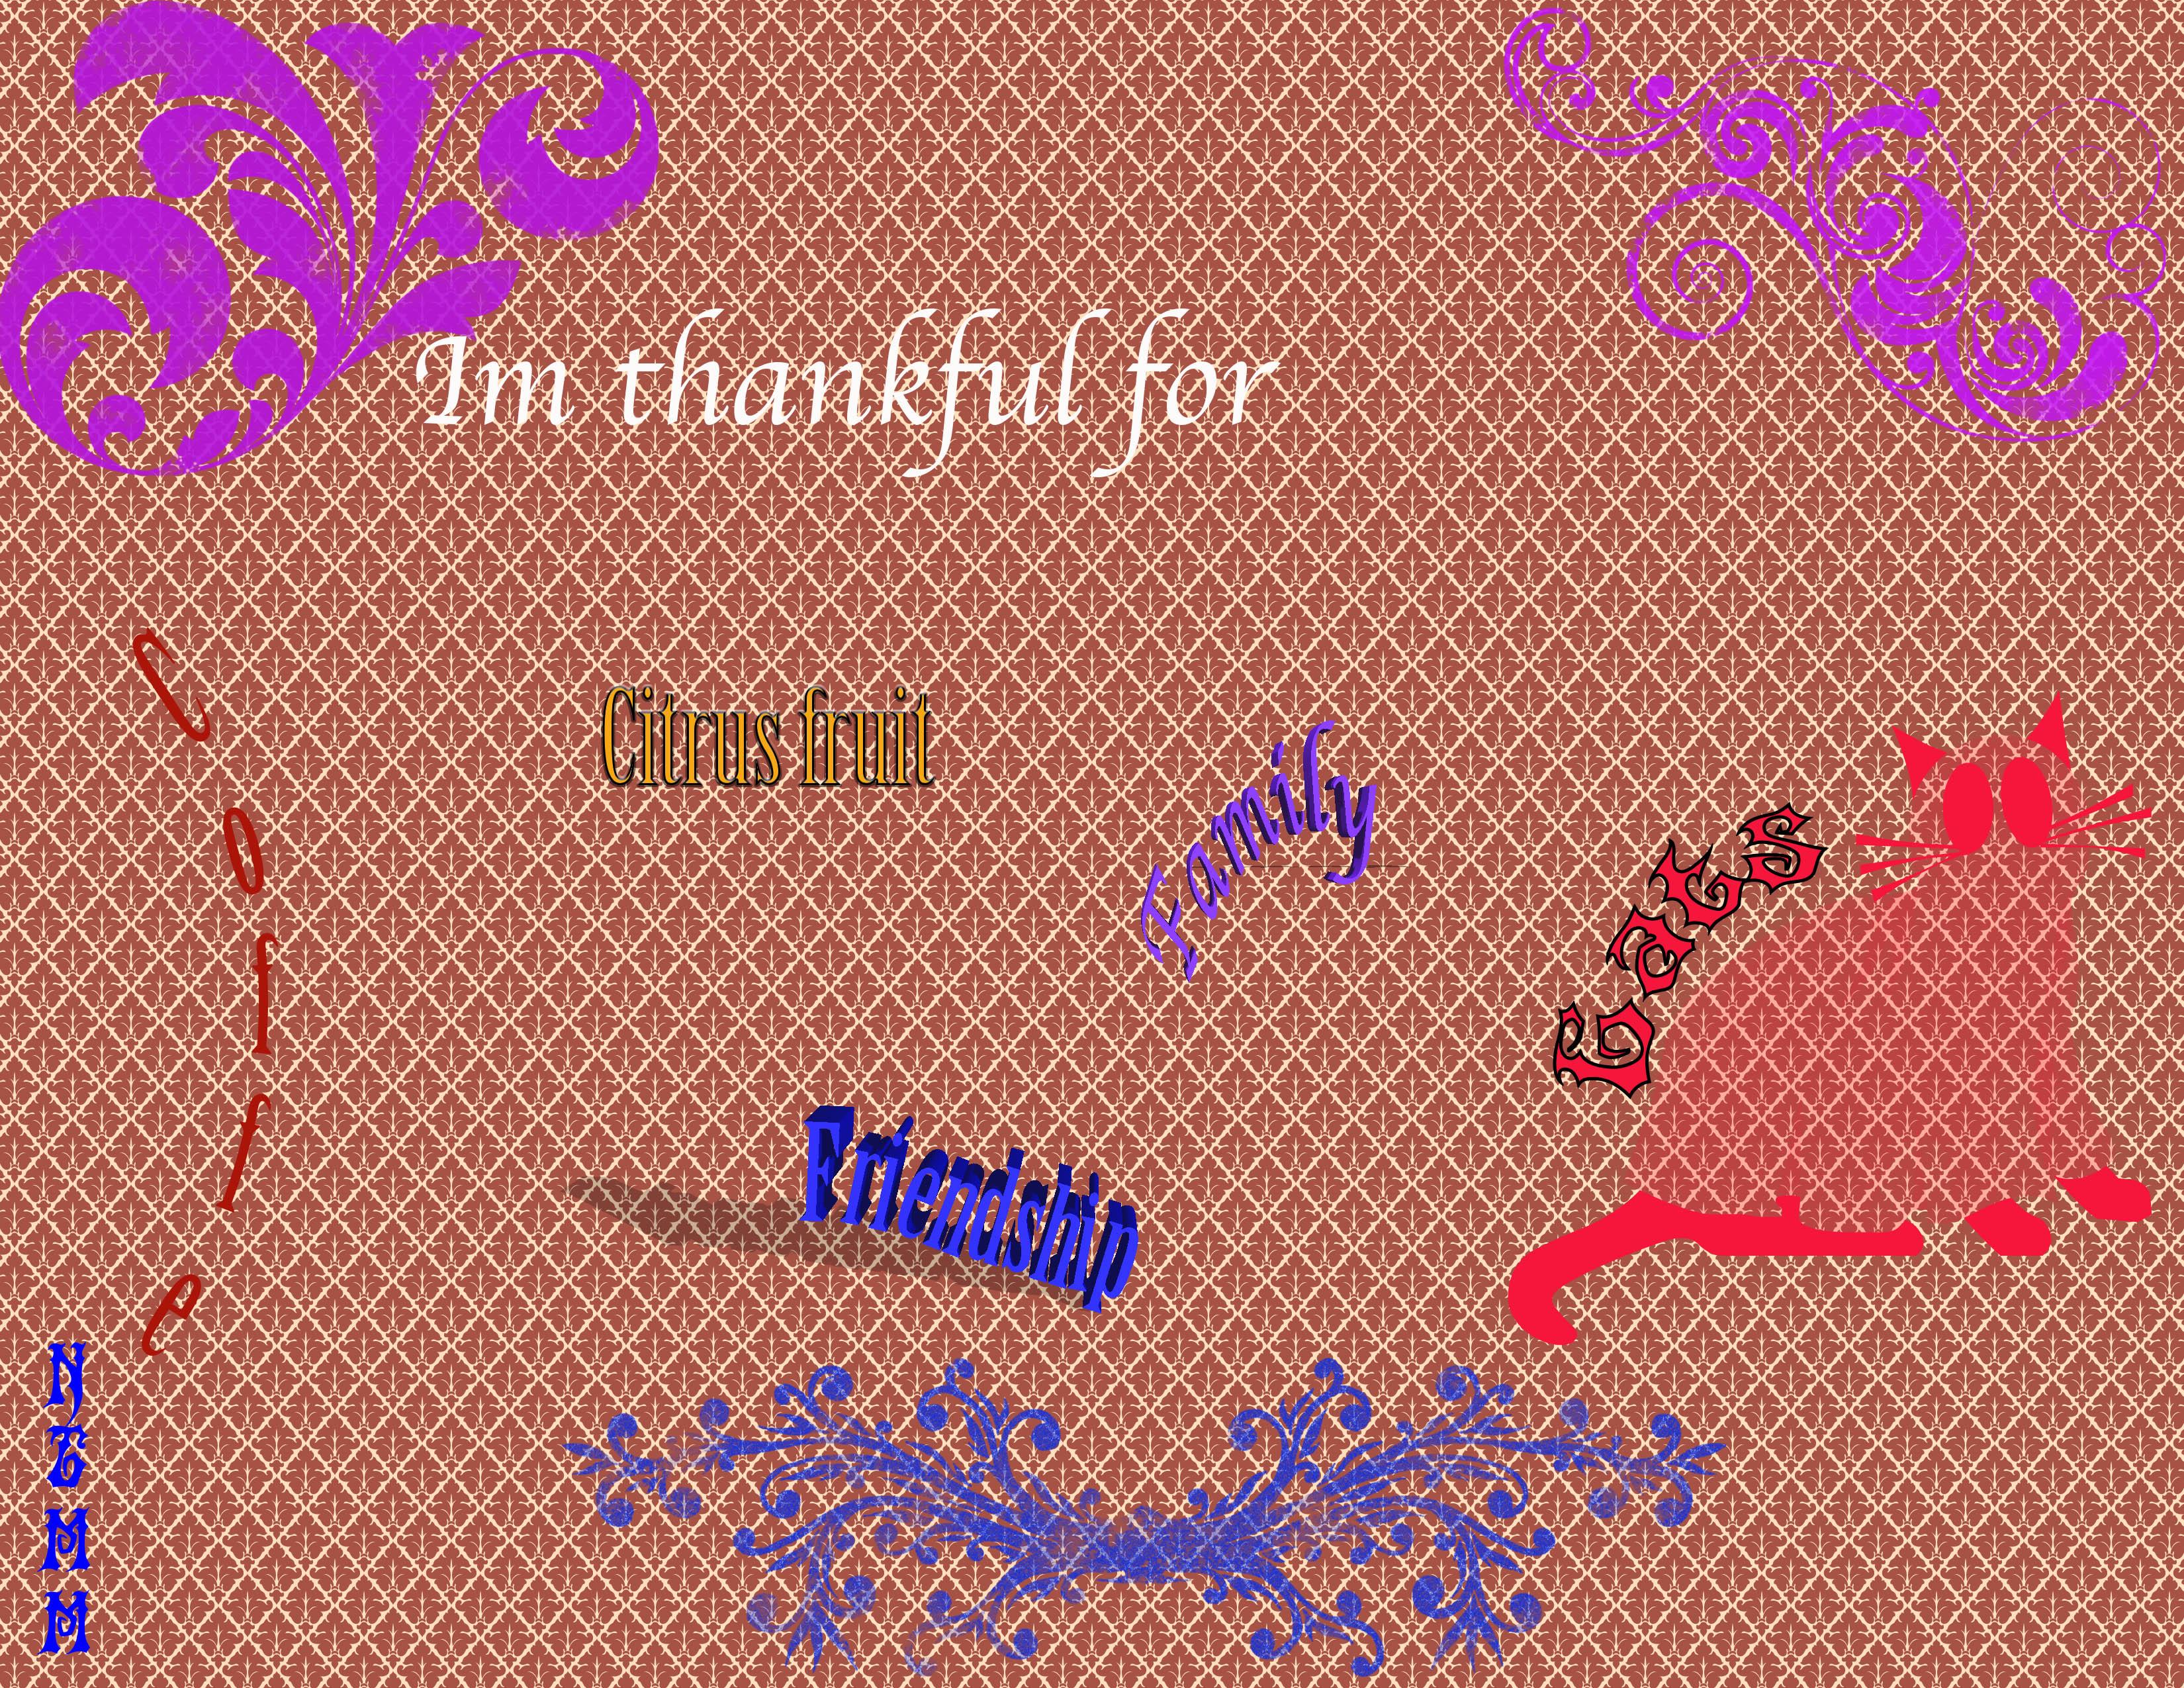 nicholas_thankful